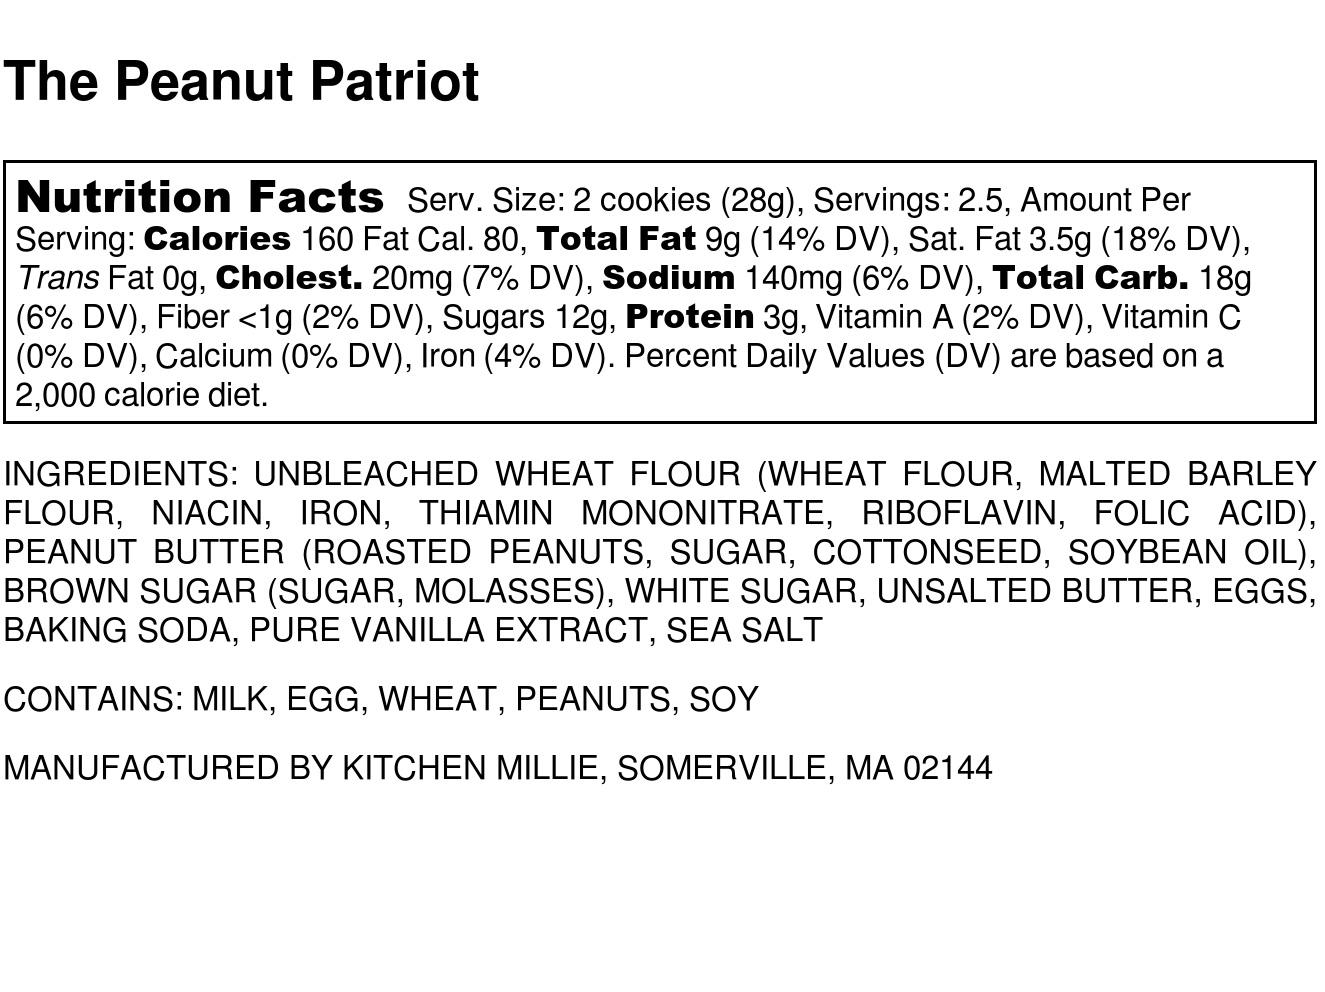 The Peanut Patriot  - Nutrition Label (1).jpg